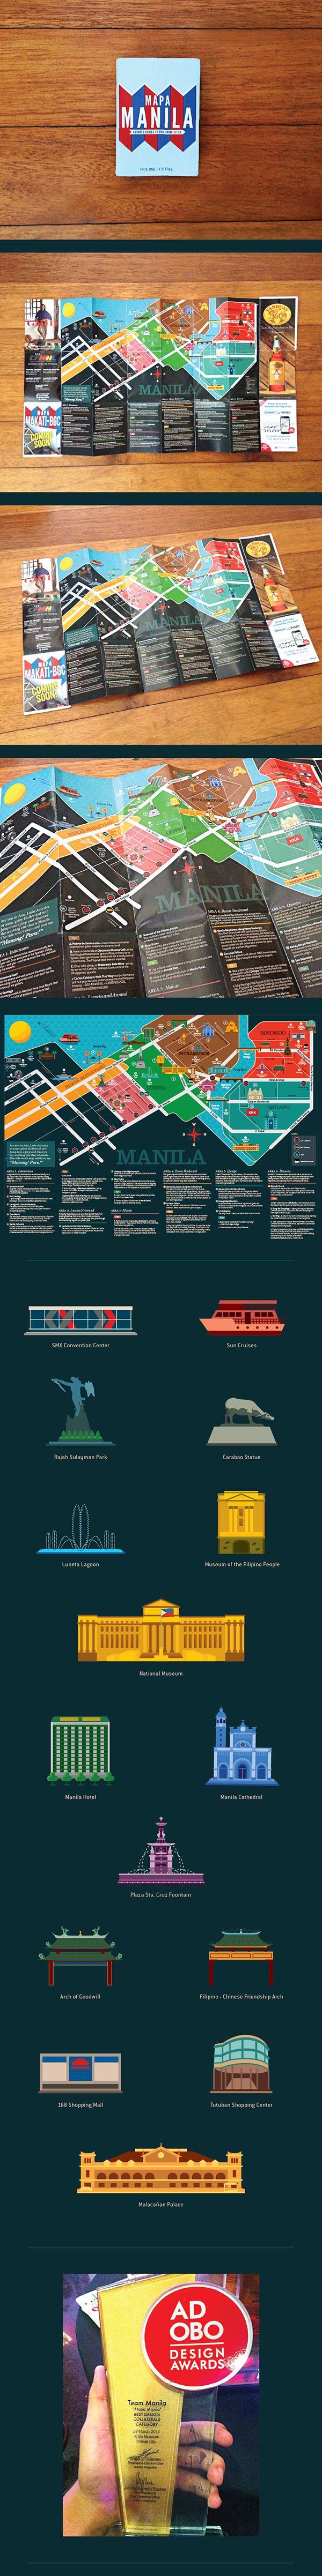 Illustrations & Layout for Mapa Manila by Jeth Torres, via Behance